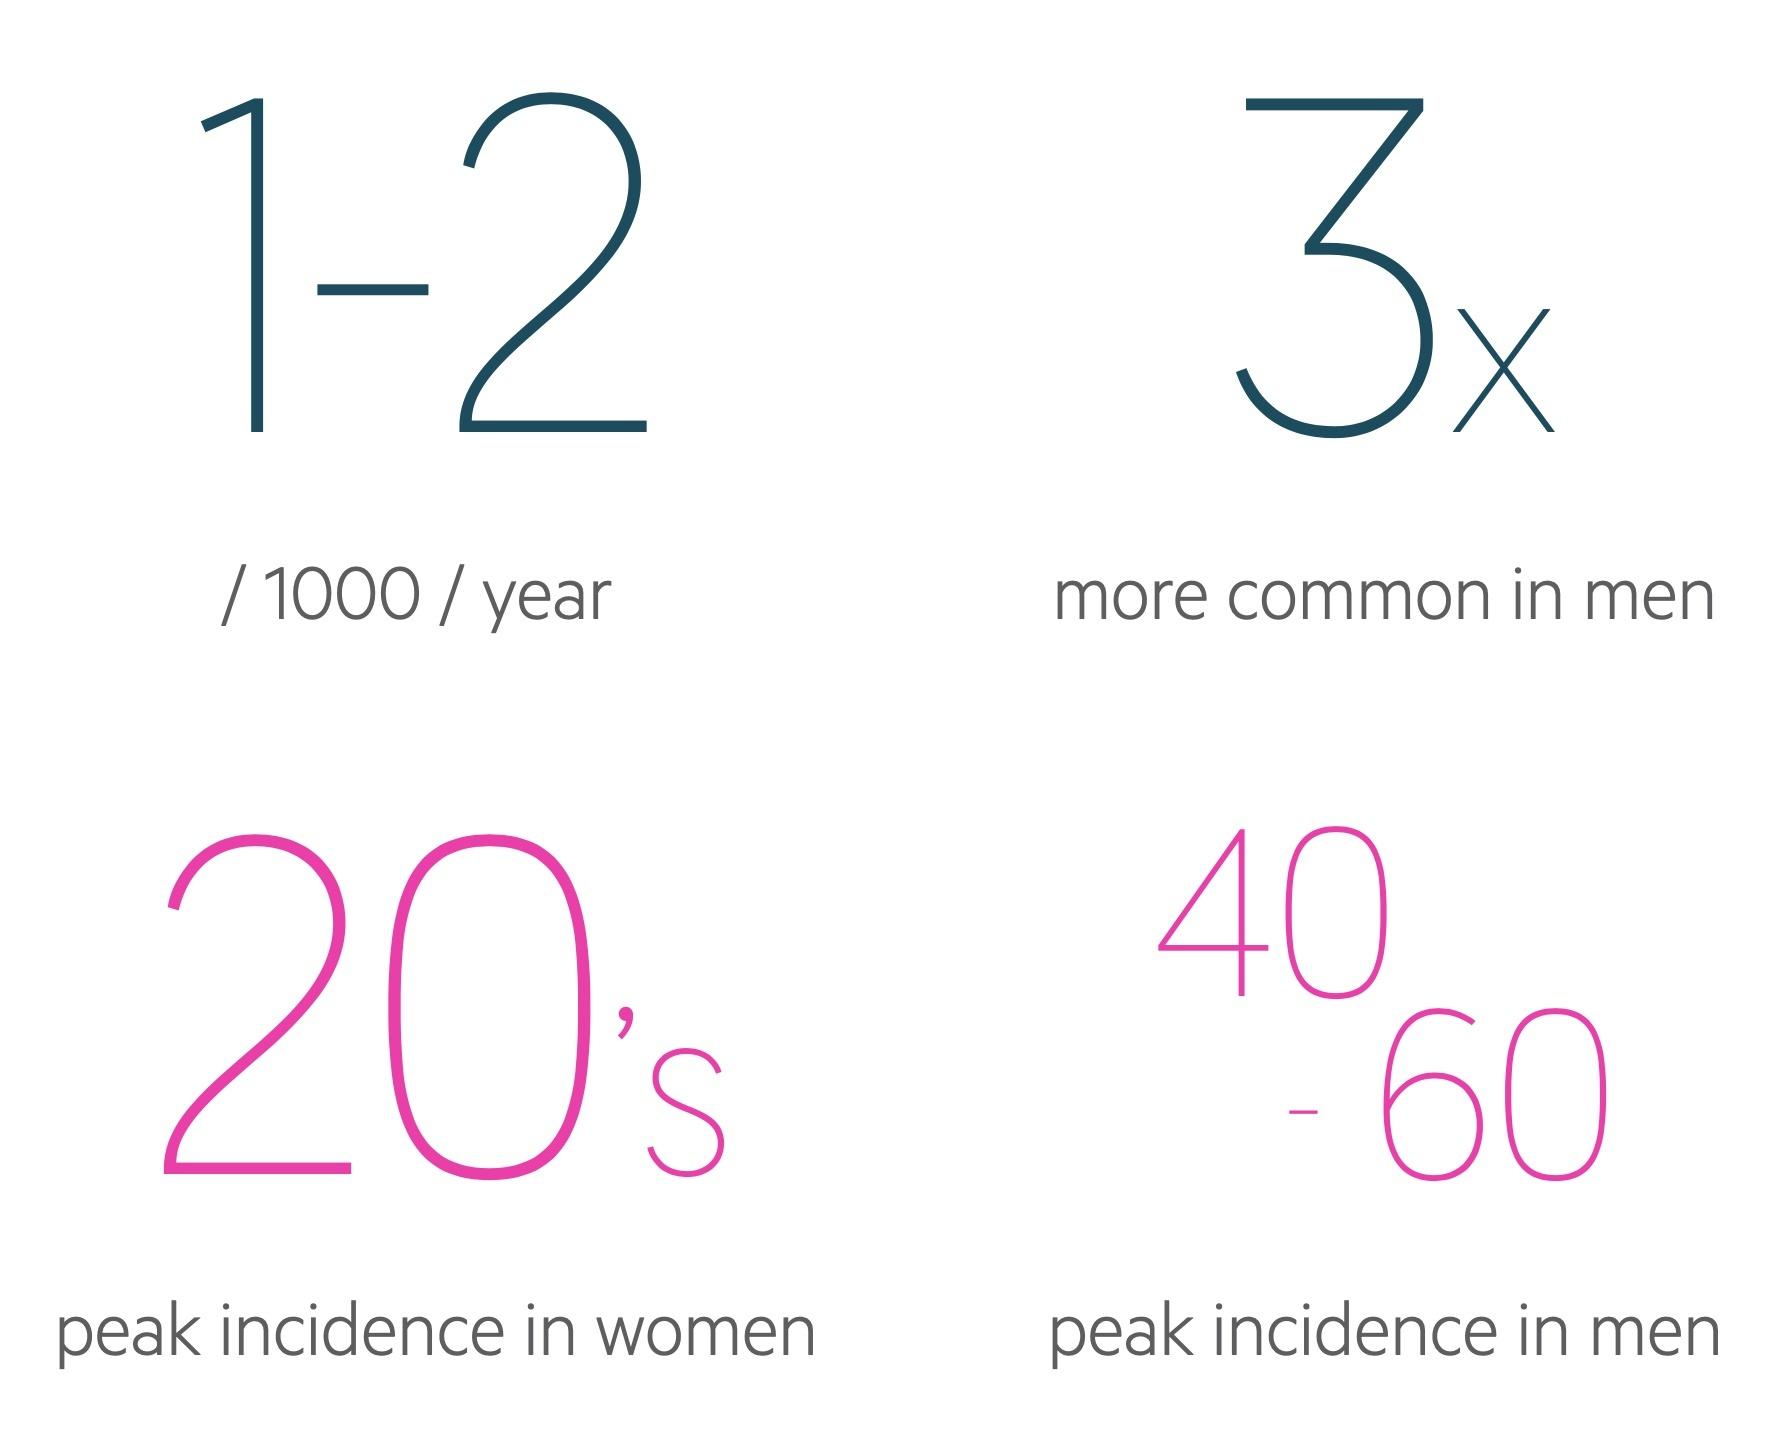 Renal colic statistics